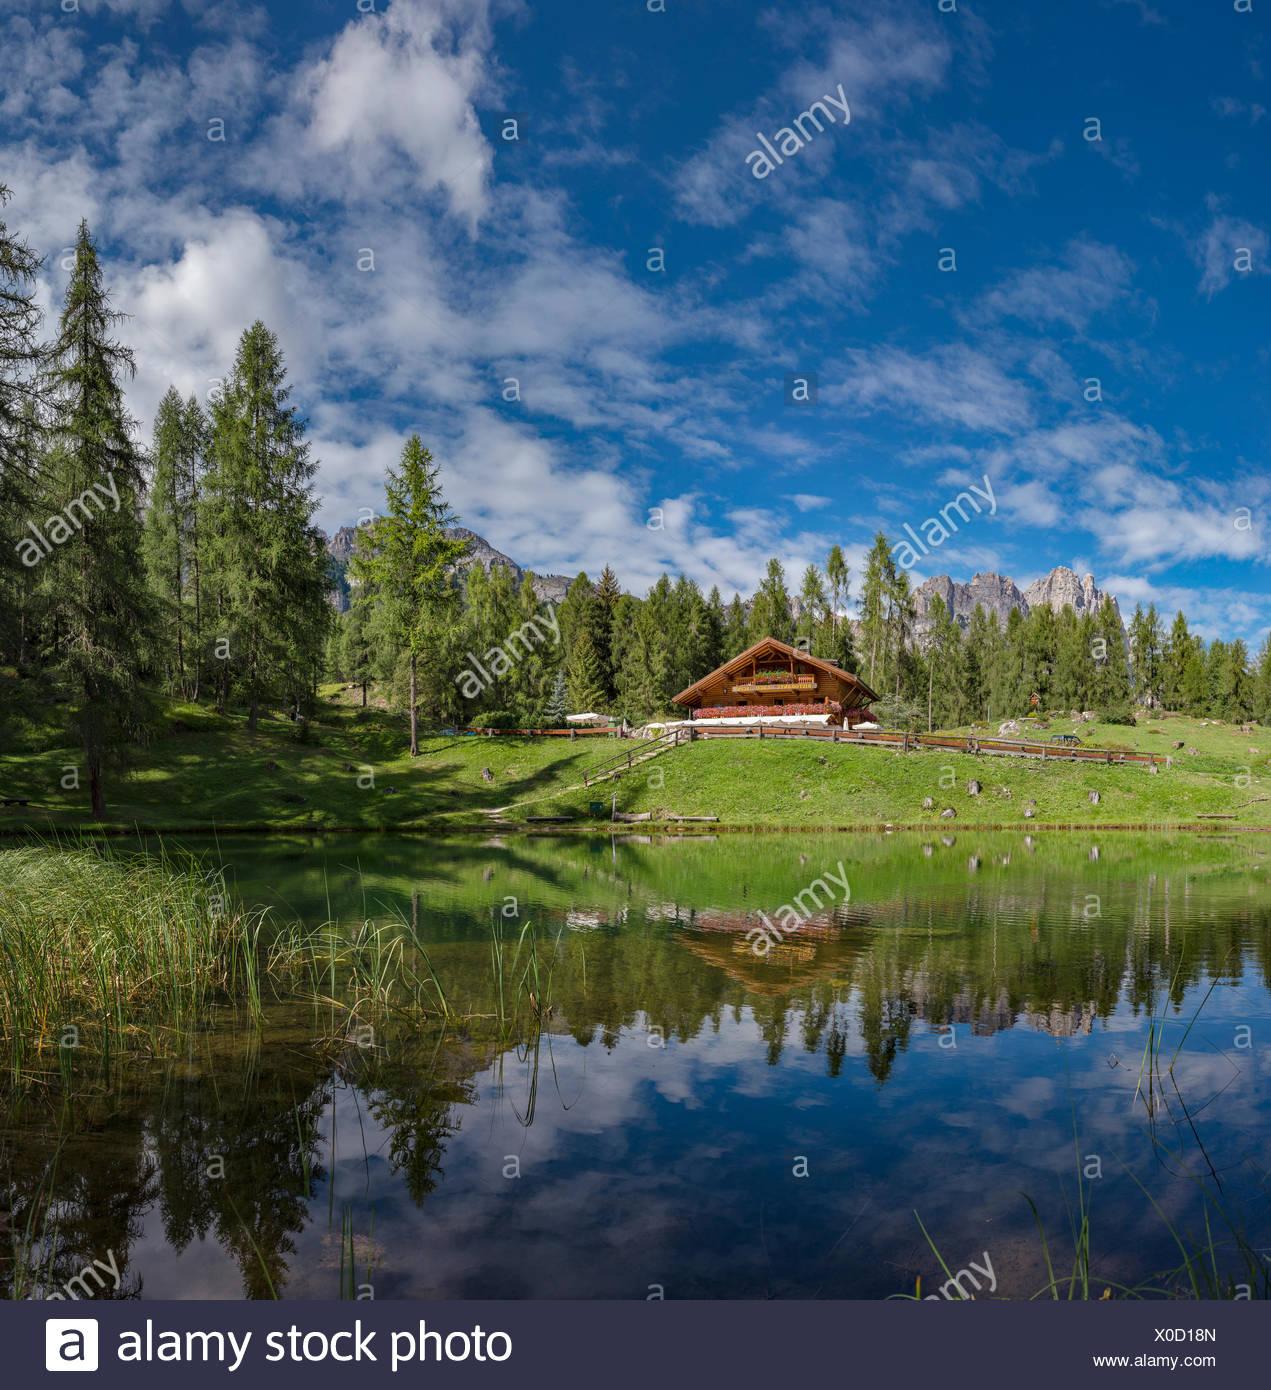 Cortina d'Ampezzo,Italia,Restaurant reflected in Lago Scin - Stock Image